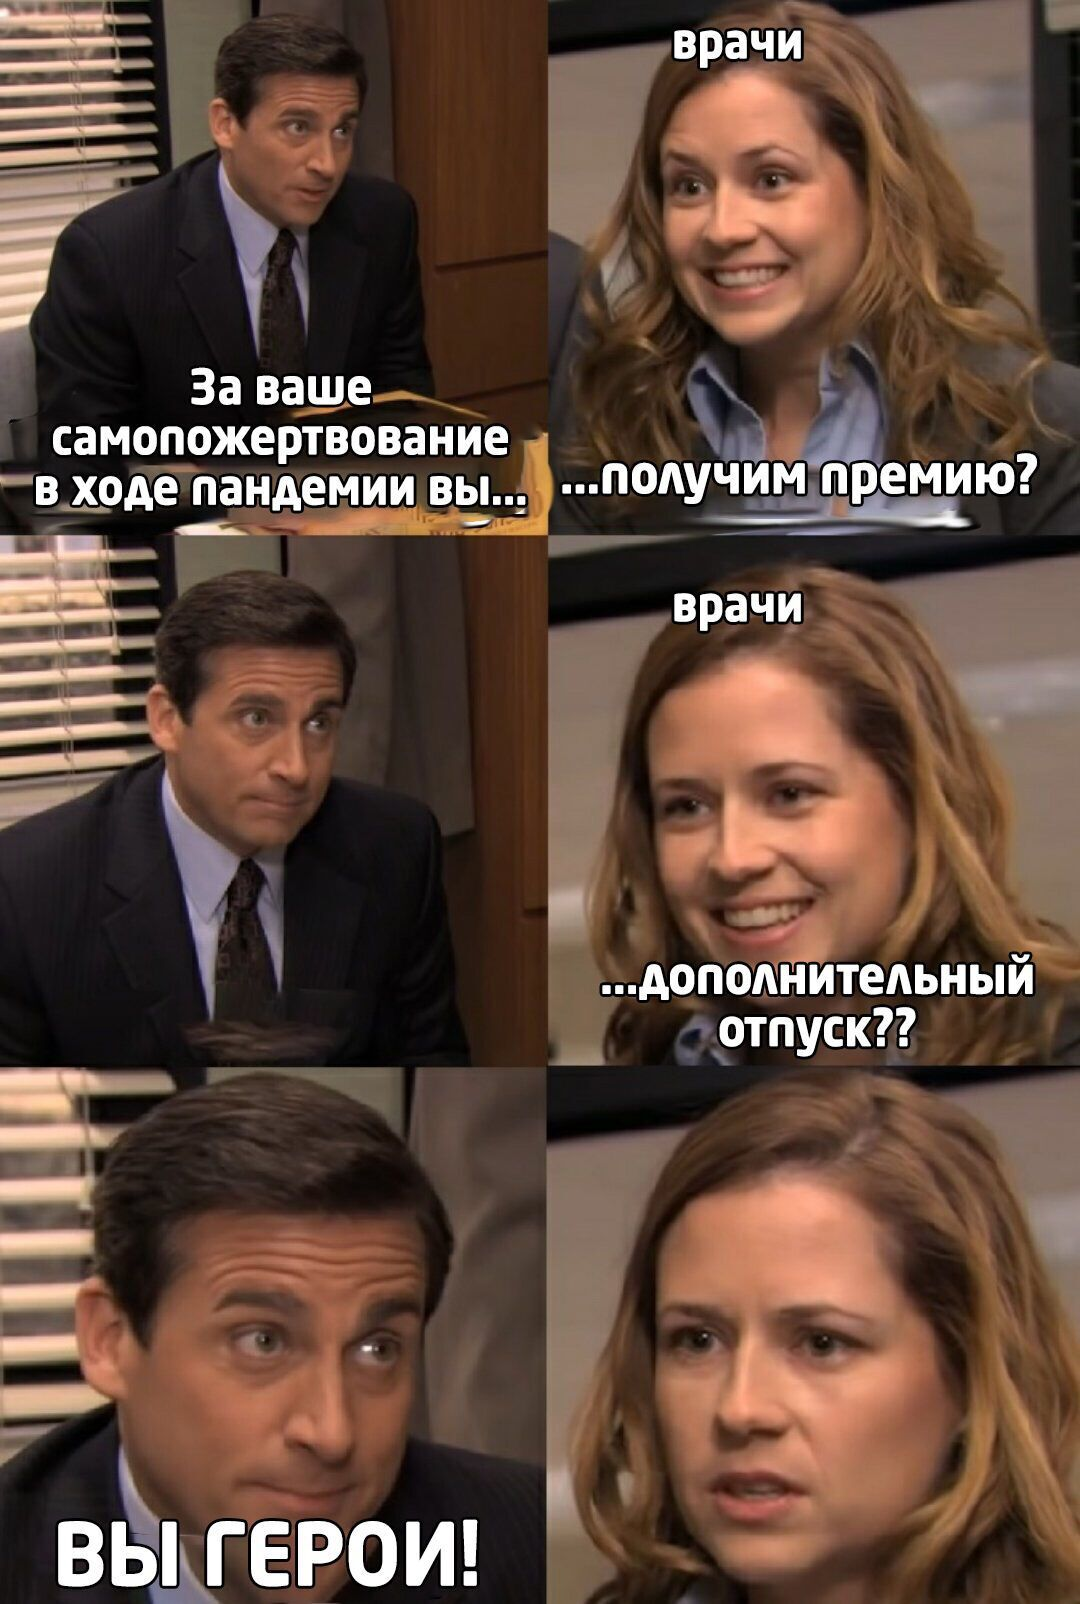 Мем о пандемии